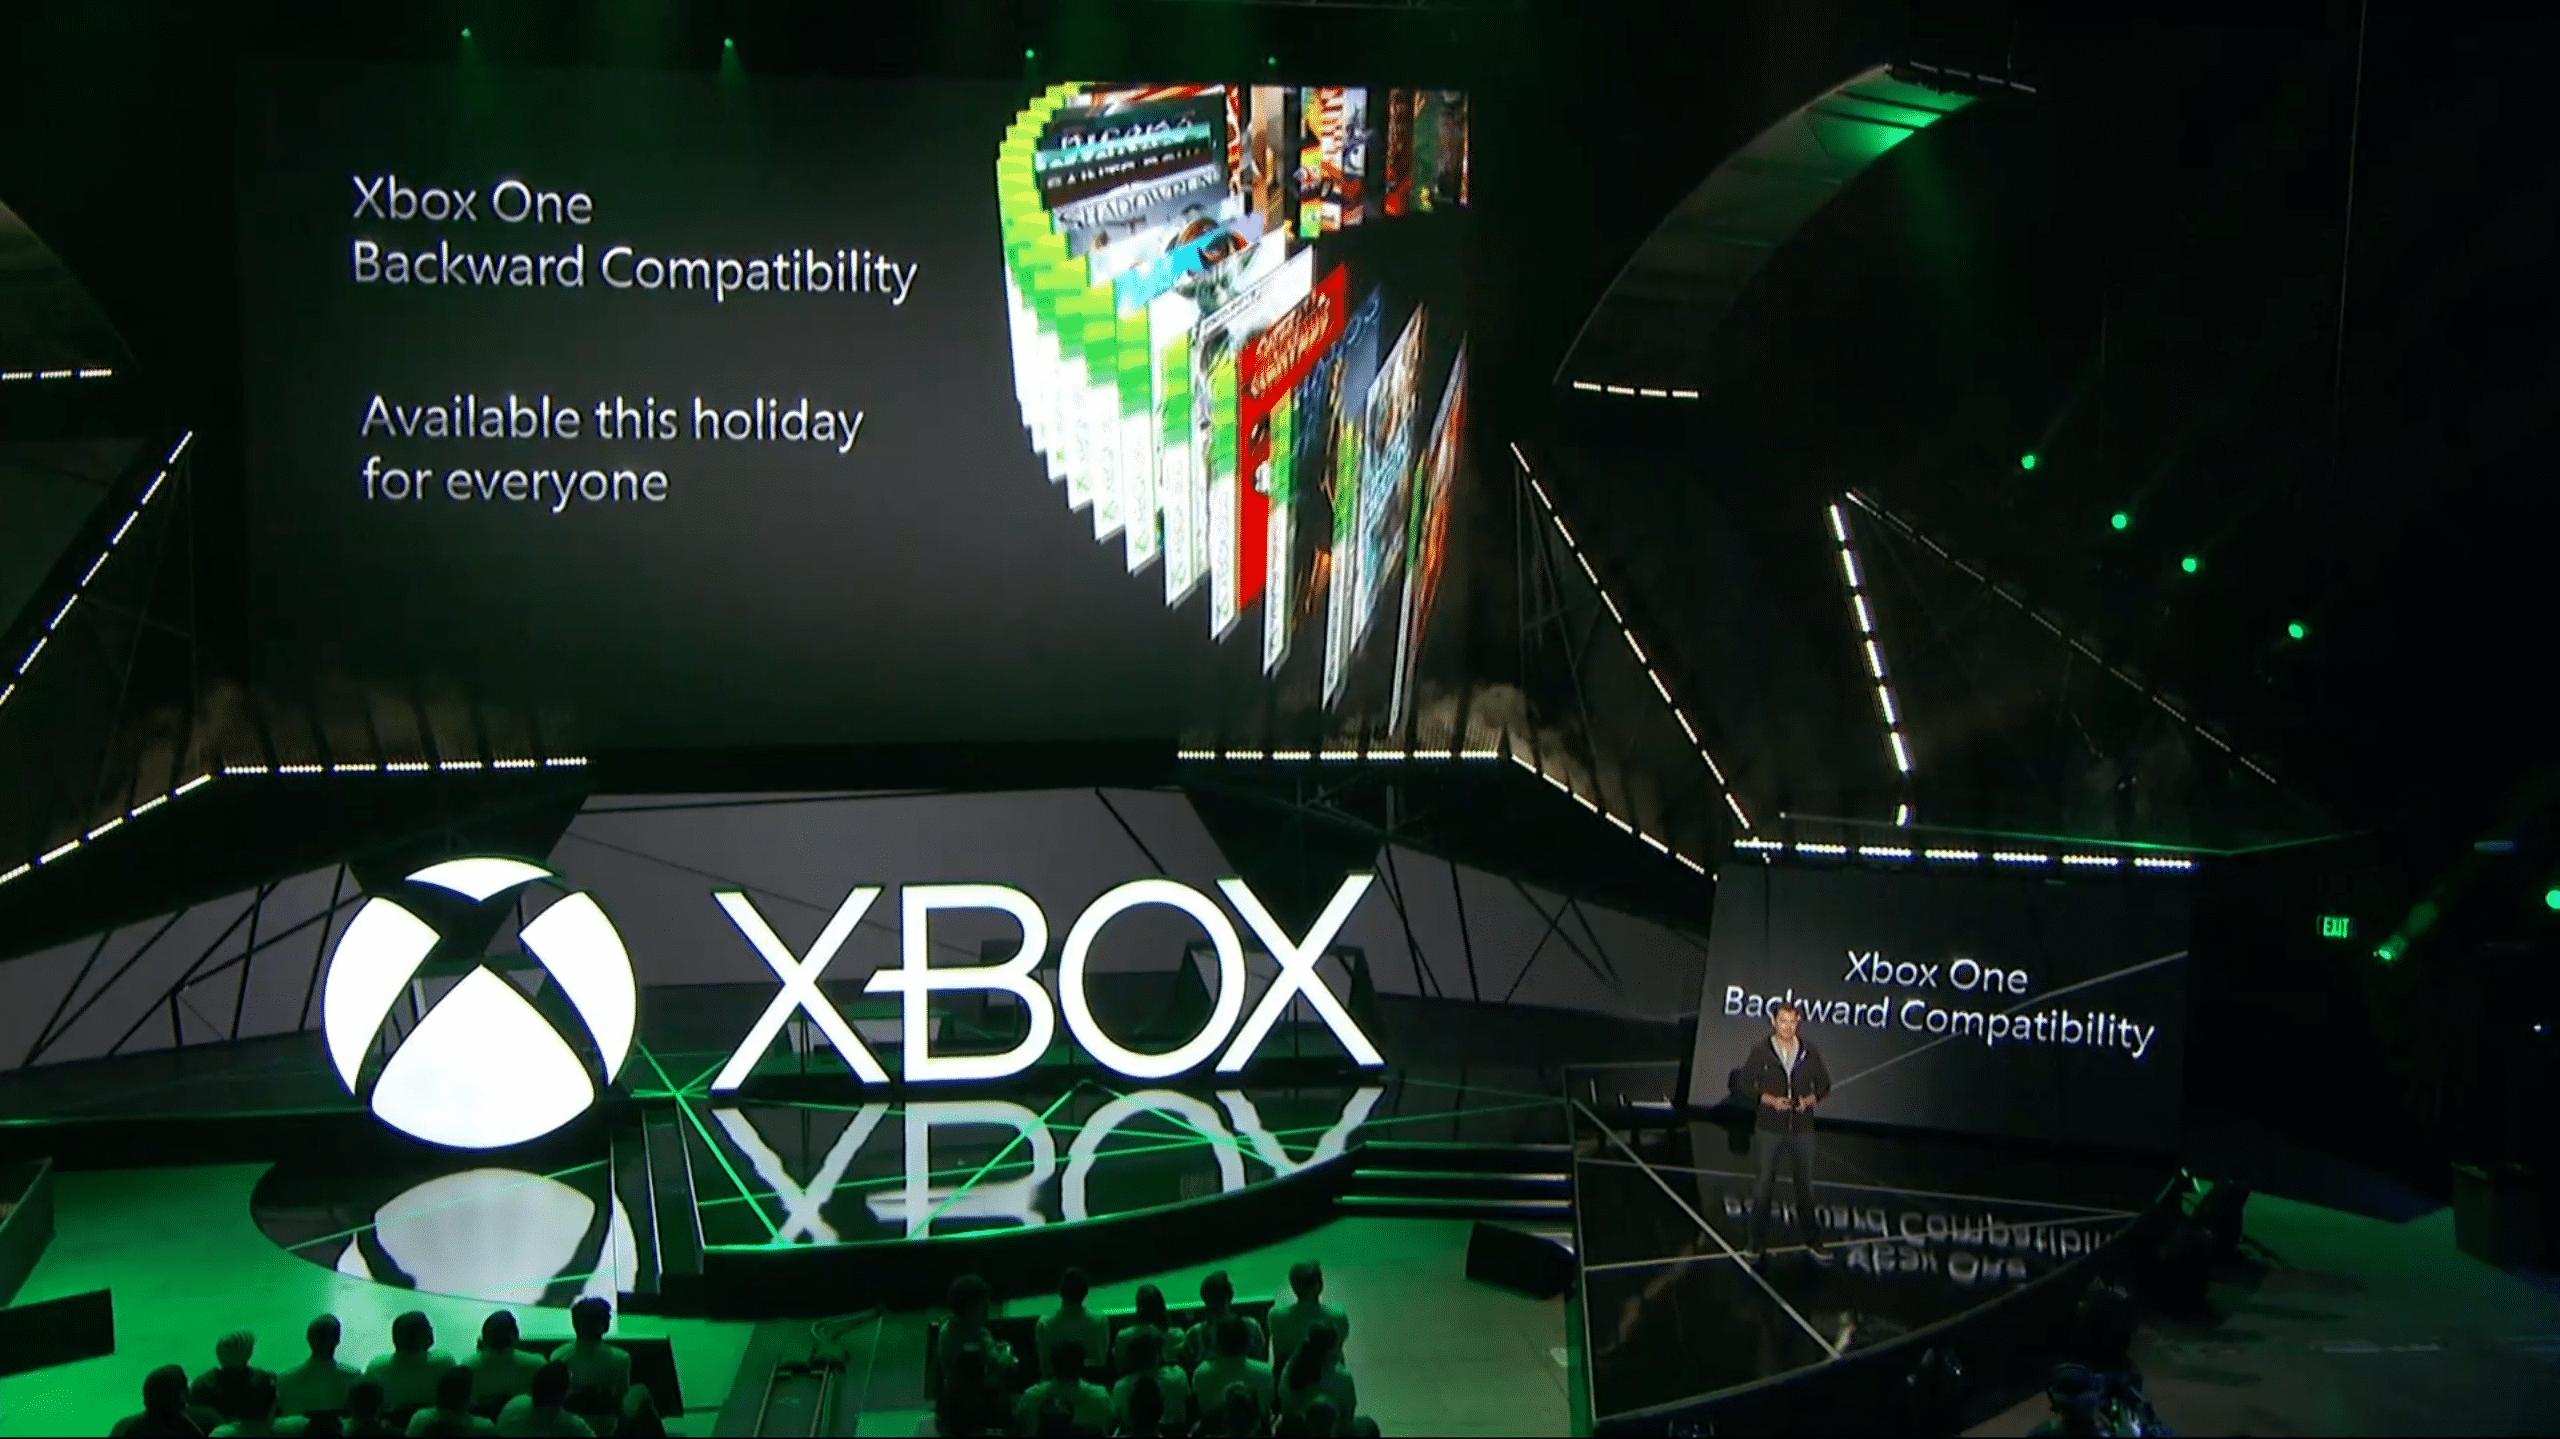 E3: Minecraft per HoloLens auf Xbox One